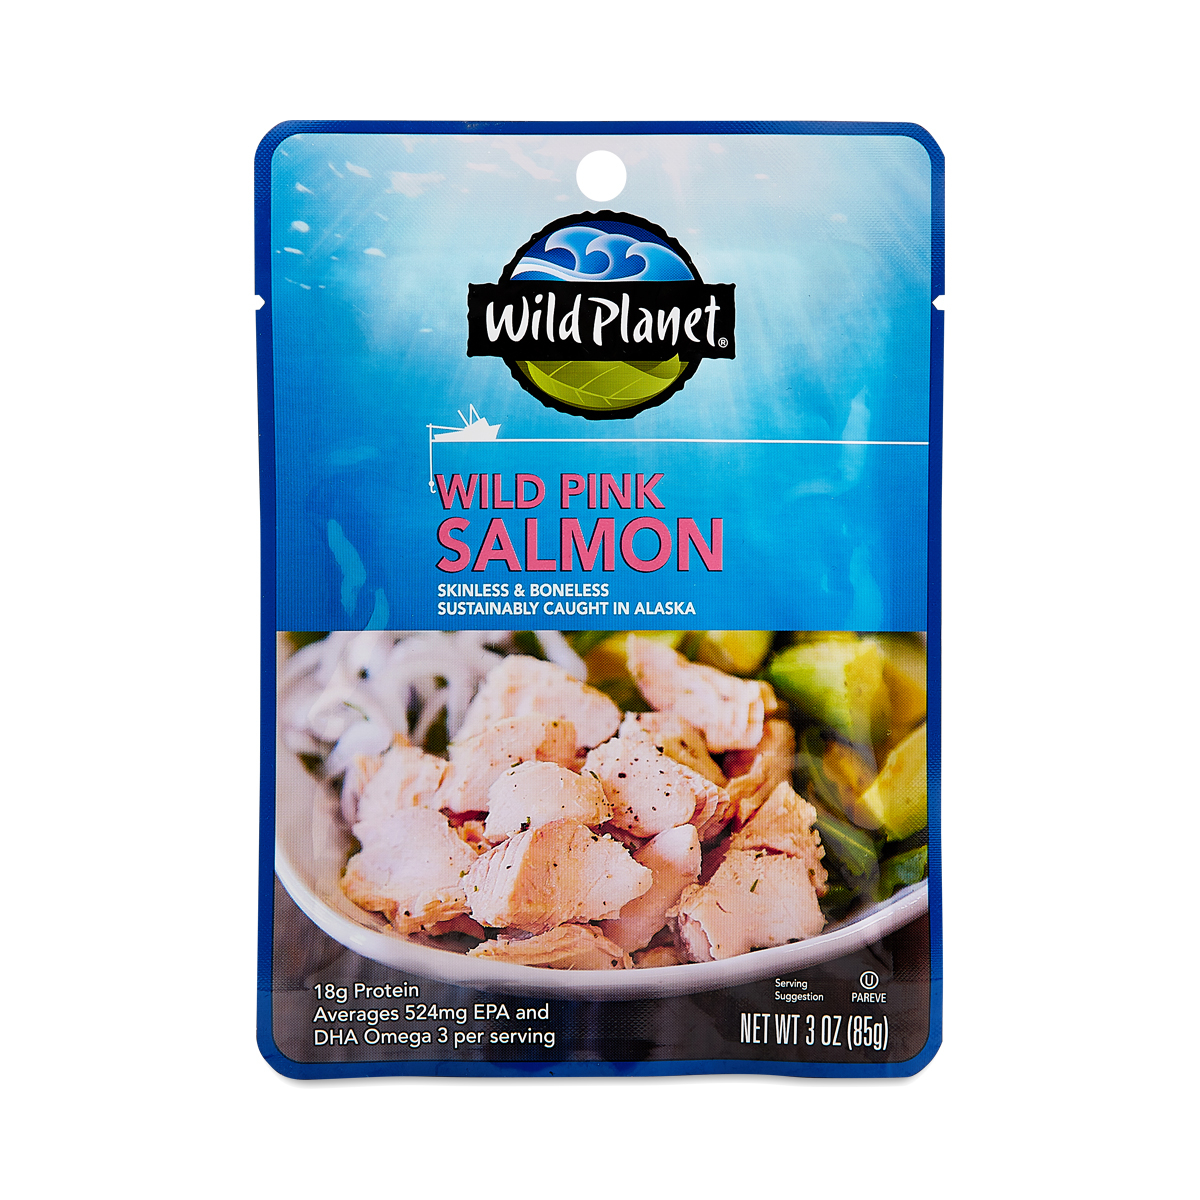 Wild Planet Wild Pink Salmon 2 oz pouch